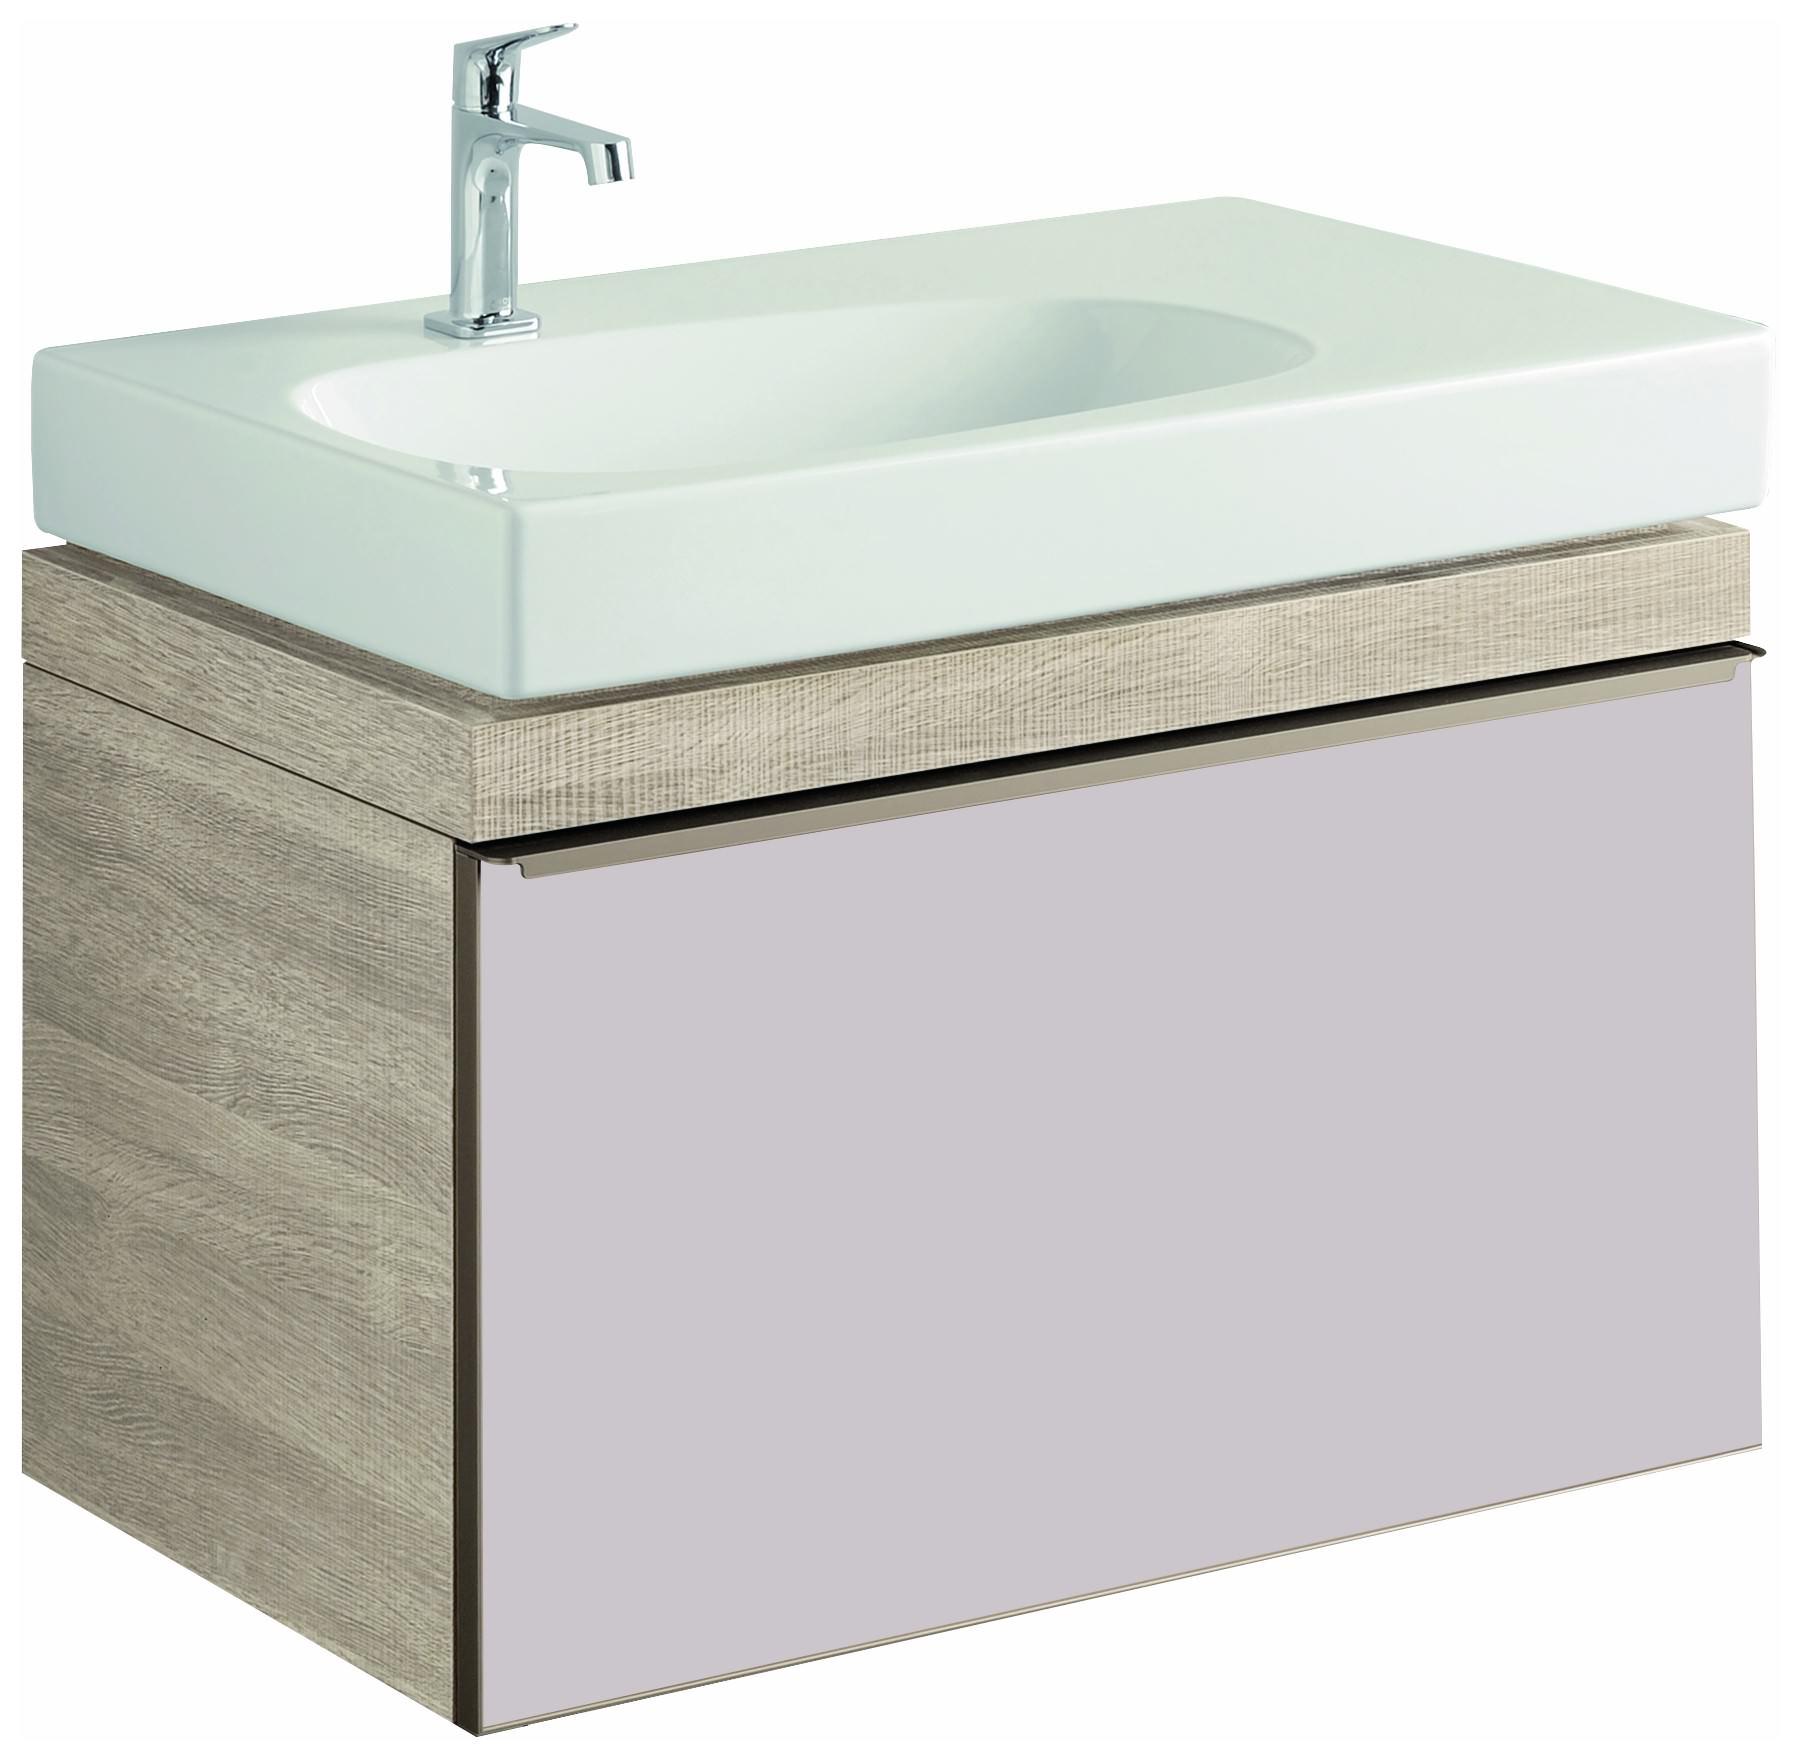 keramag citterio waschtischunterschrank 734x554x504mm holzstruktur naturbeige 835175000. Black Bedroom Furniture Sets. Home Design Ideas